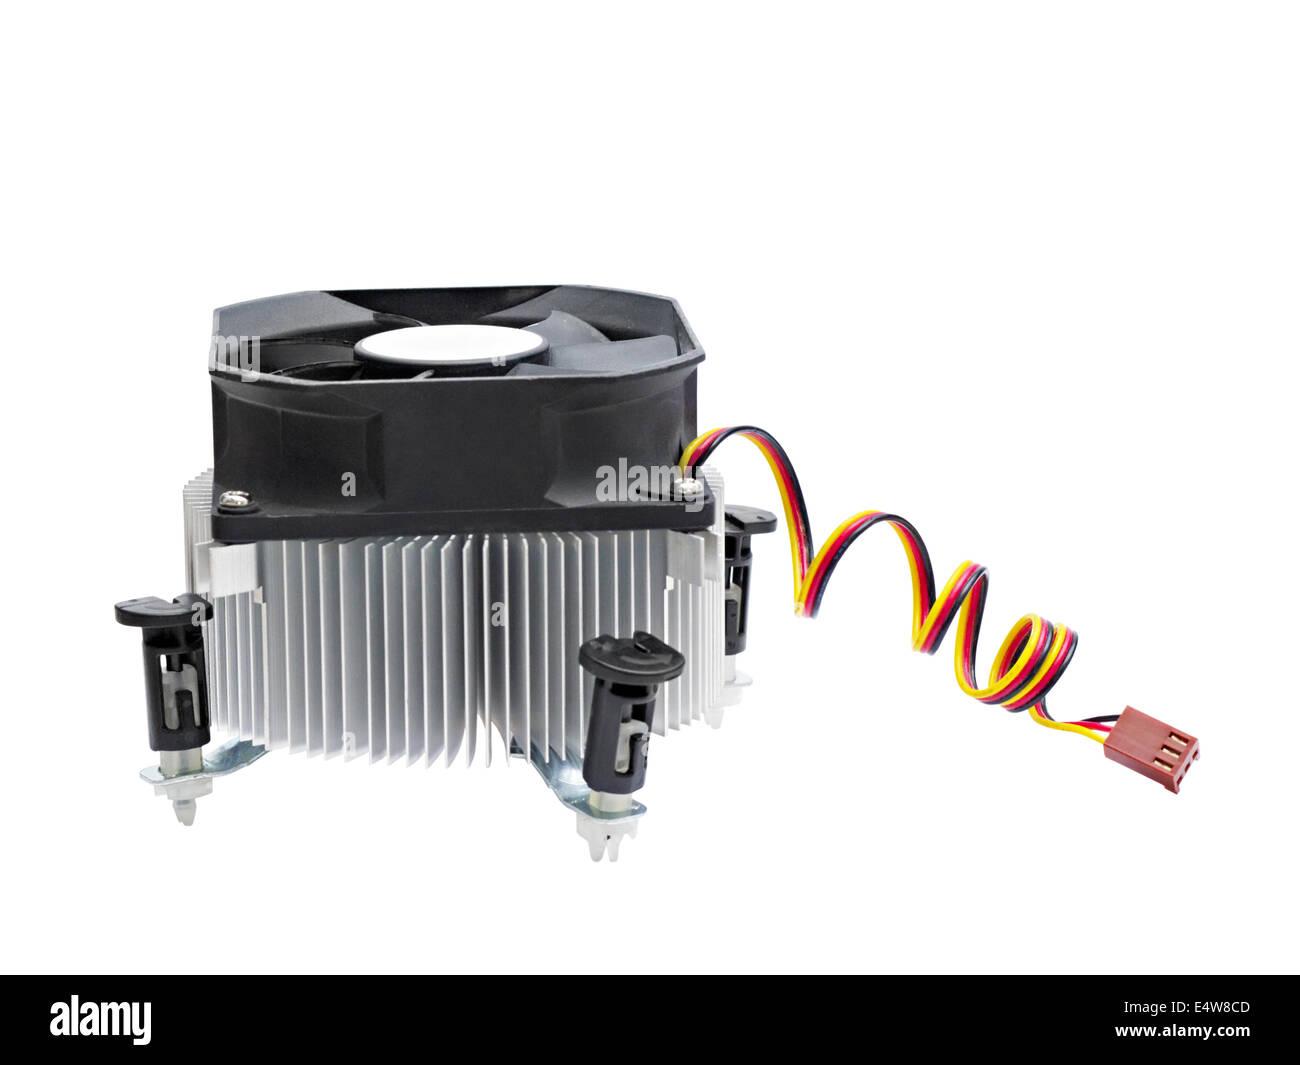 Refroidisseur pour CPU Photo Stock